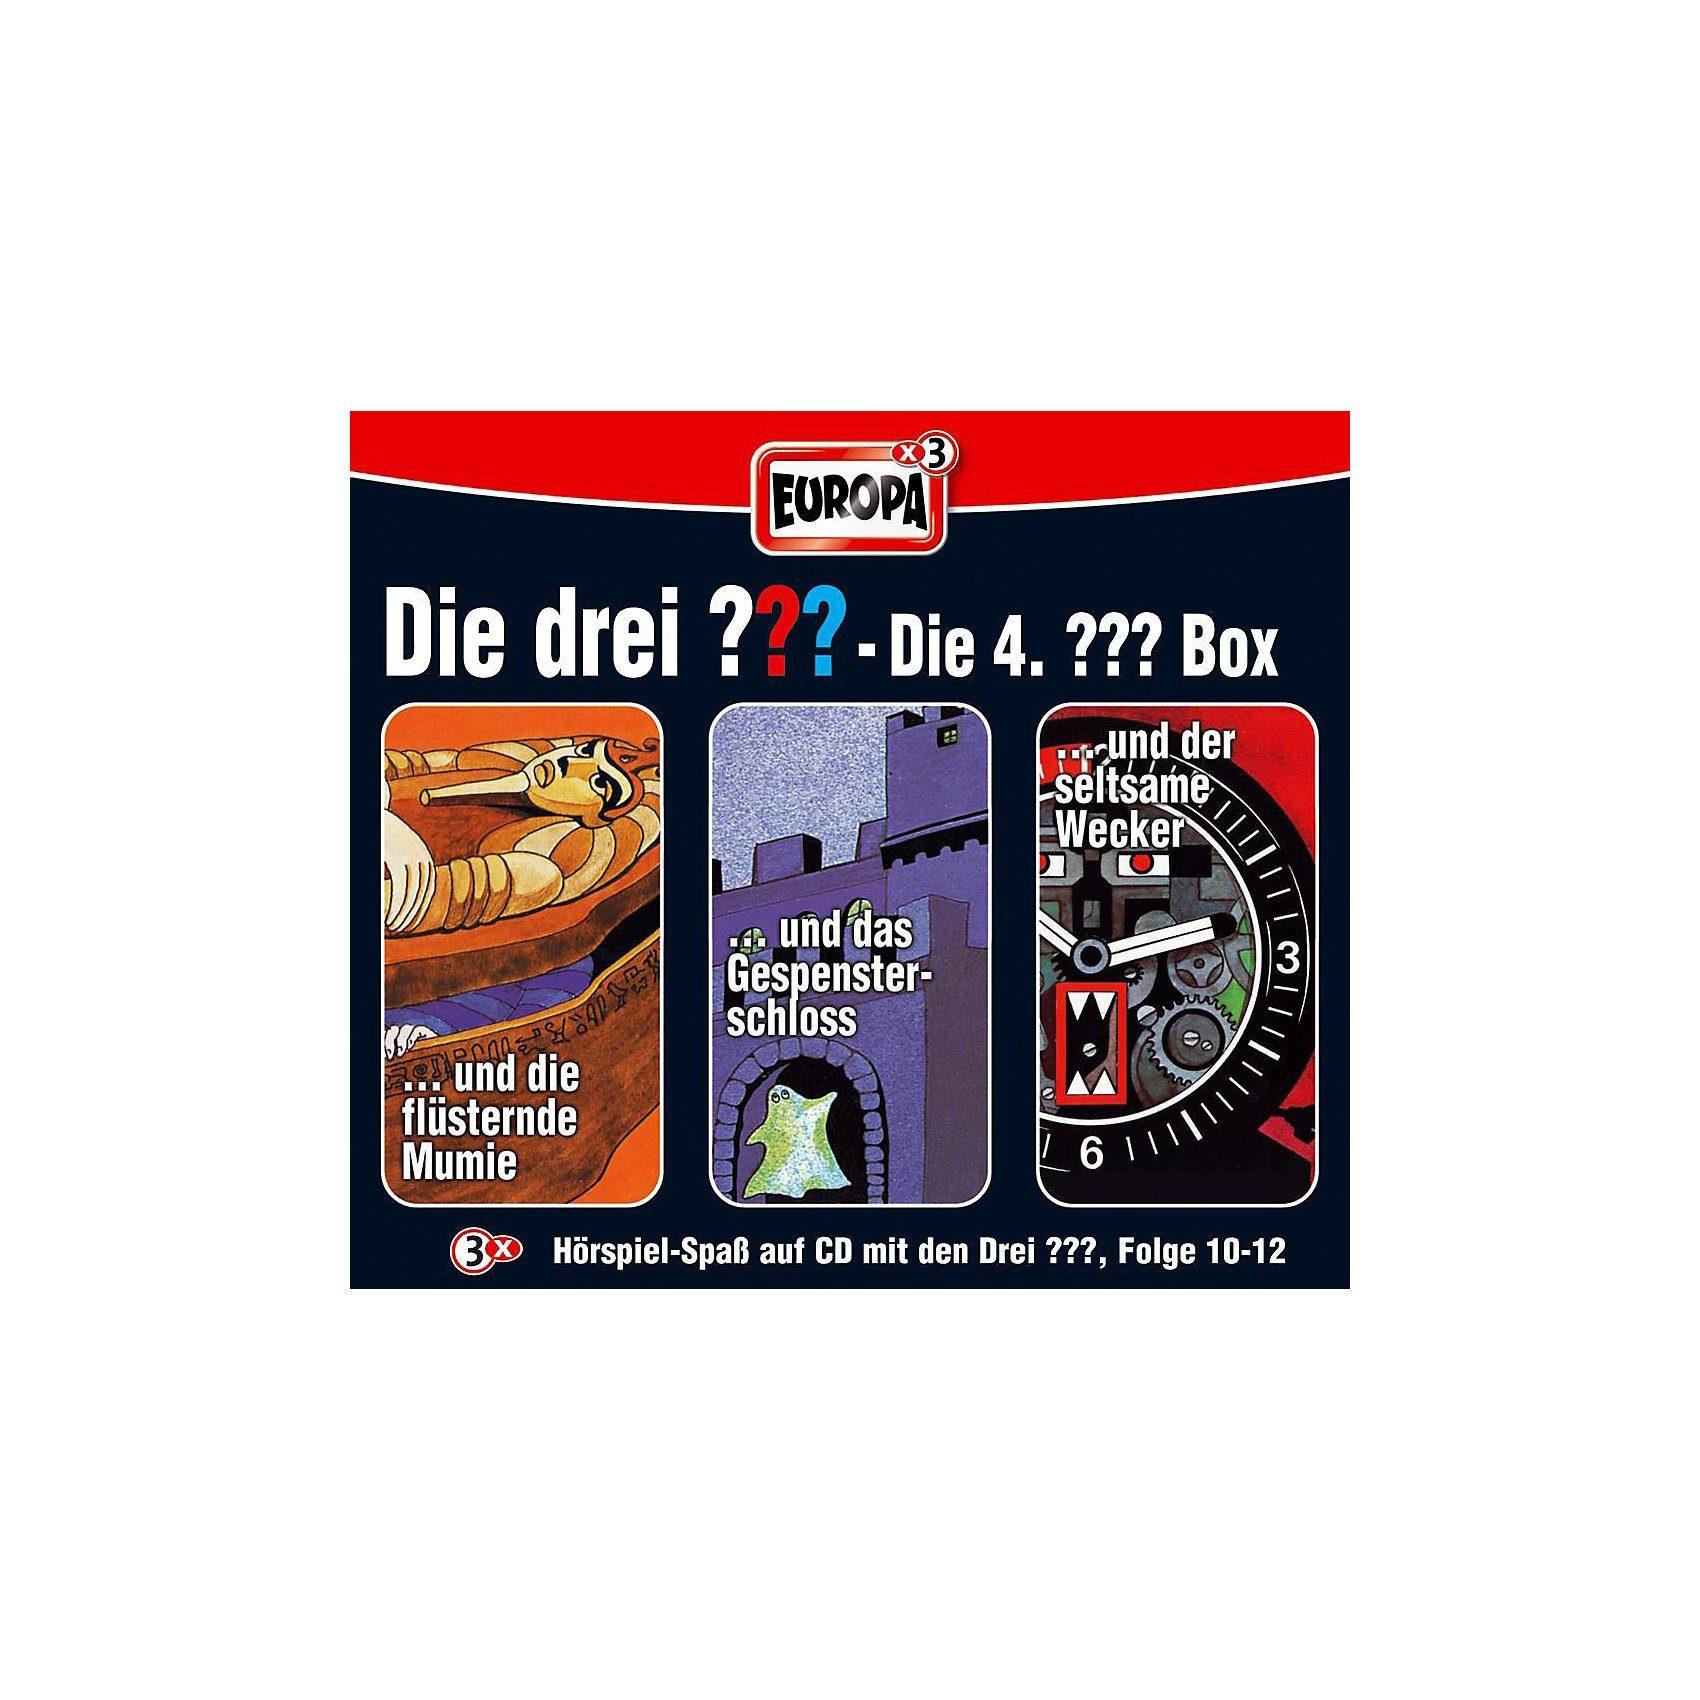 Sony CD Die drei ??? 010-012: Box (Folge 10 - 12)